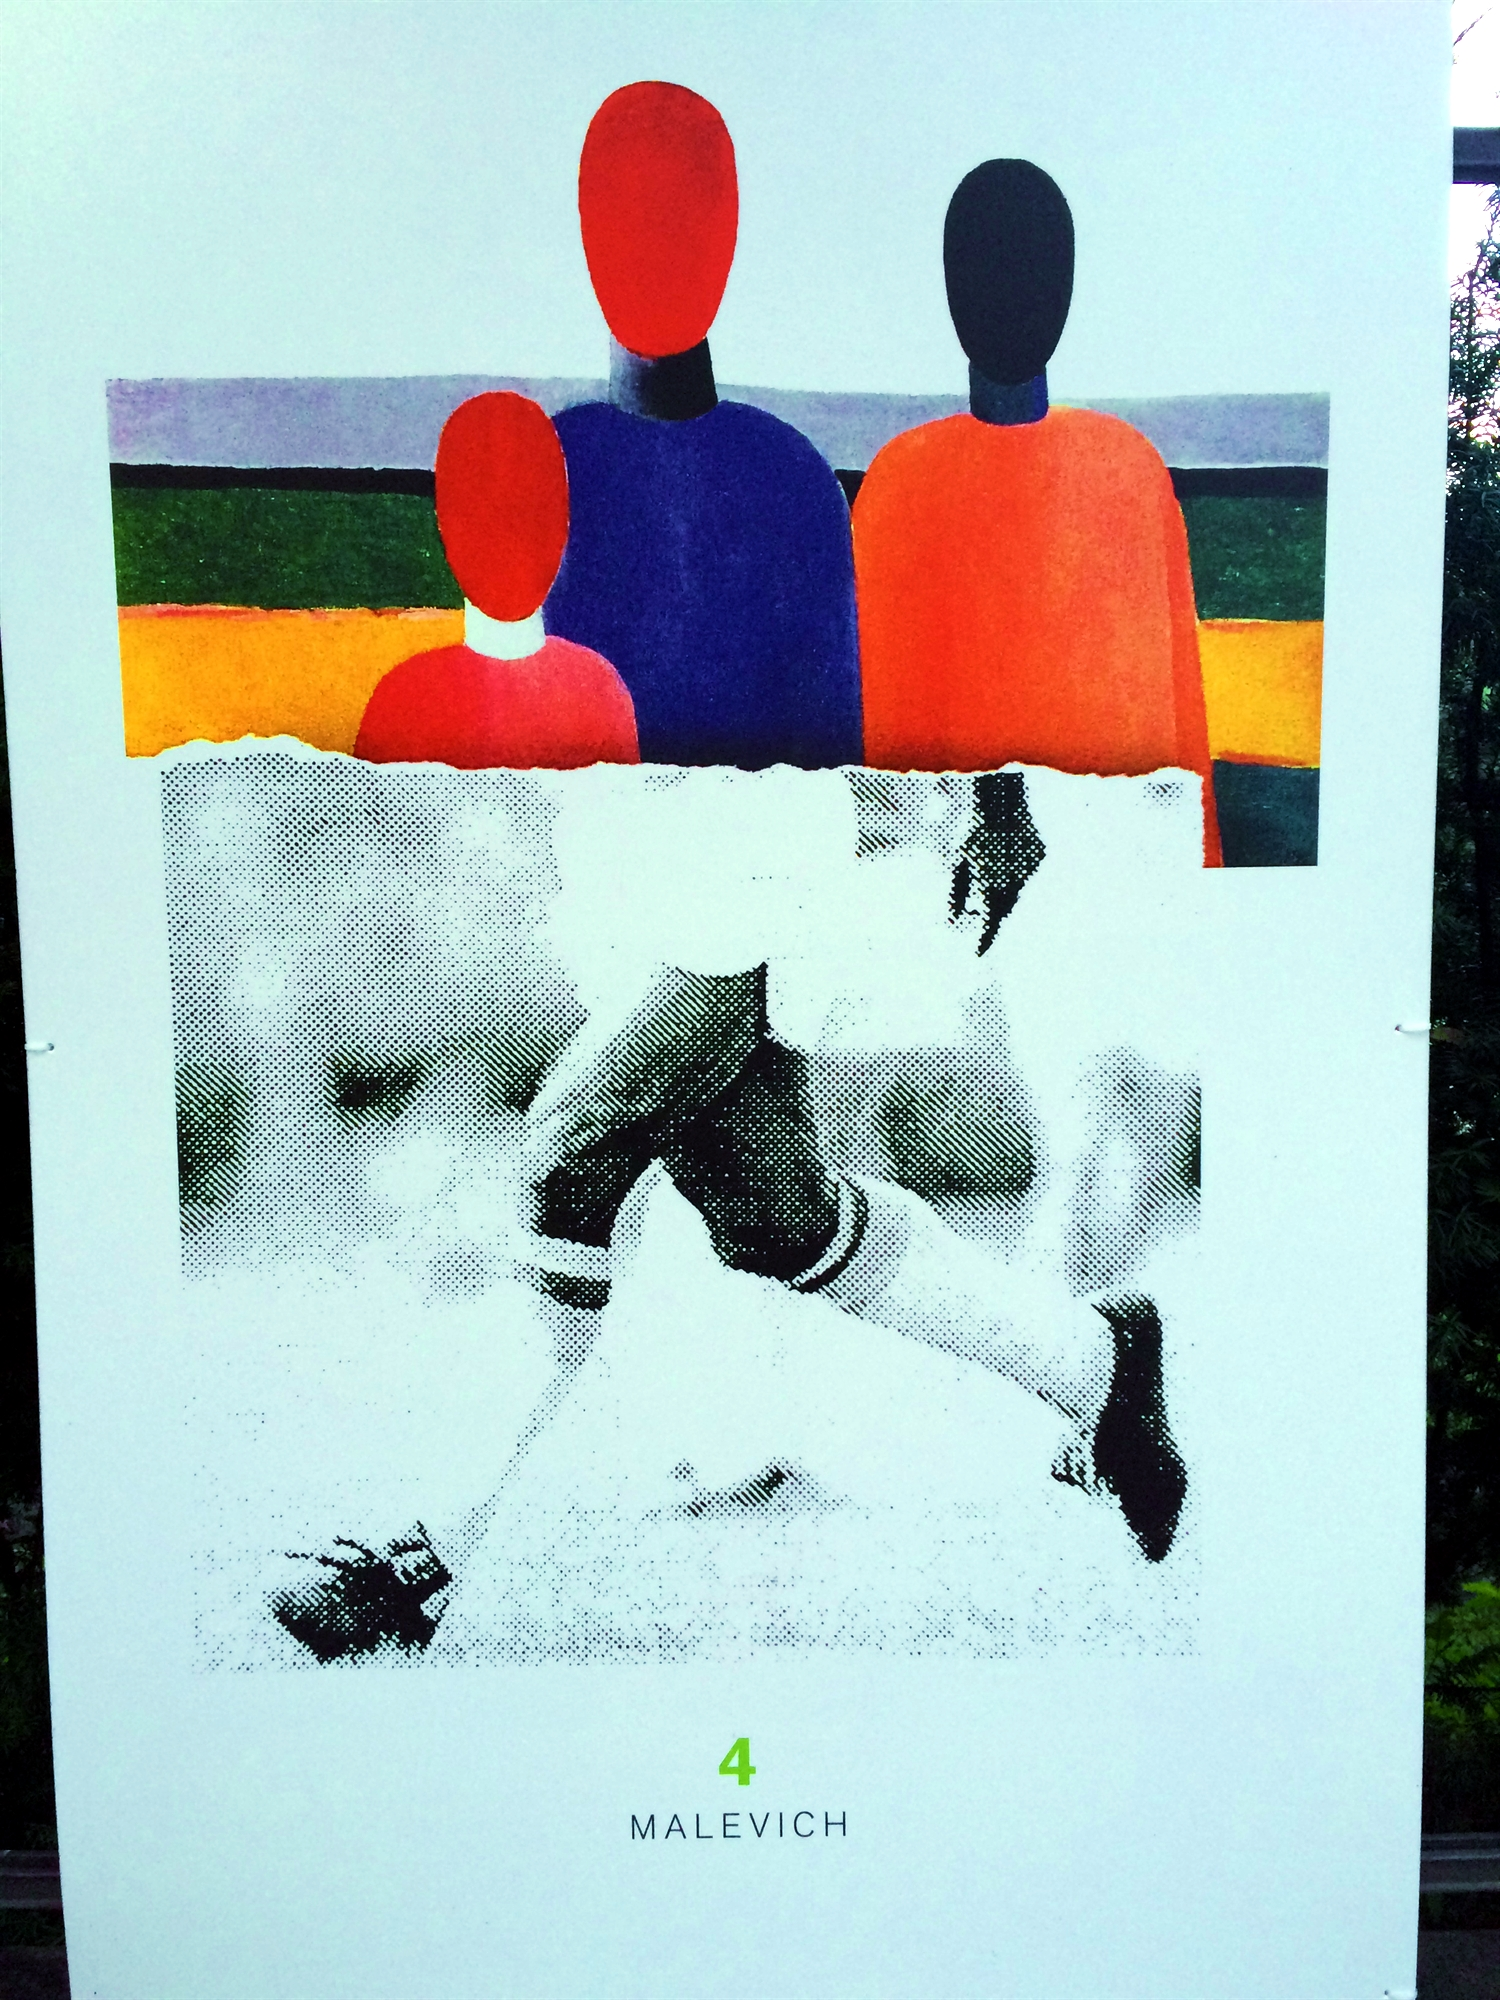 29 Mexican poster street art design plakat meksykanski projektowanie uzytkowe sztuka uliczna FORelementspl